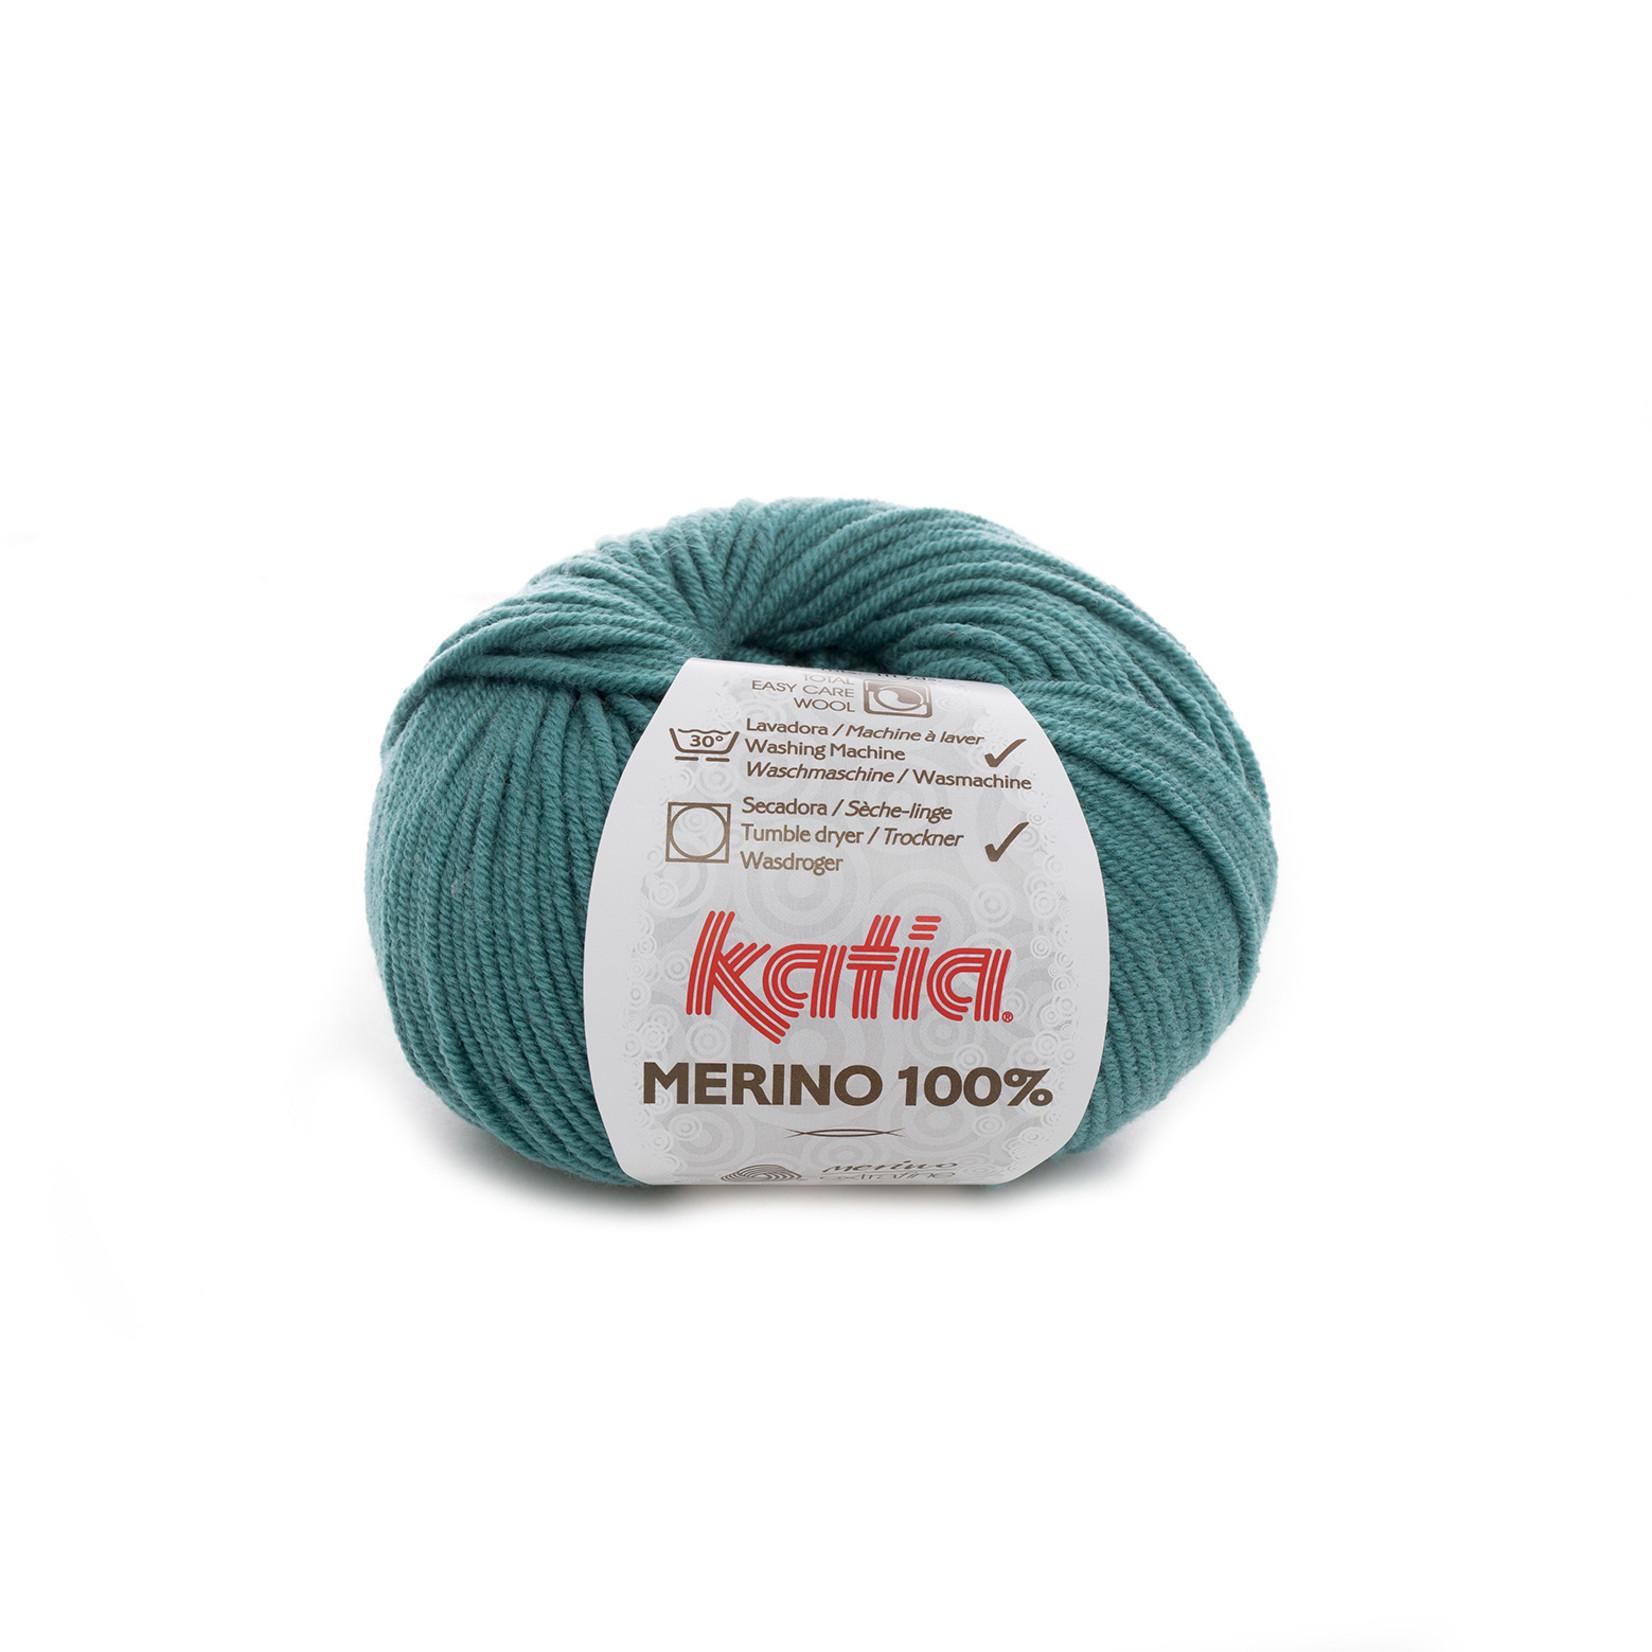 Katia Katia Merino 100% - 54 - Groen_ - 50 gr. = 102 m.